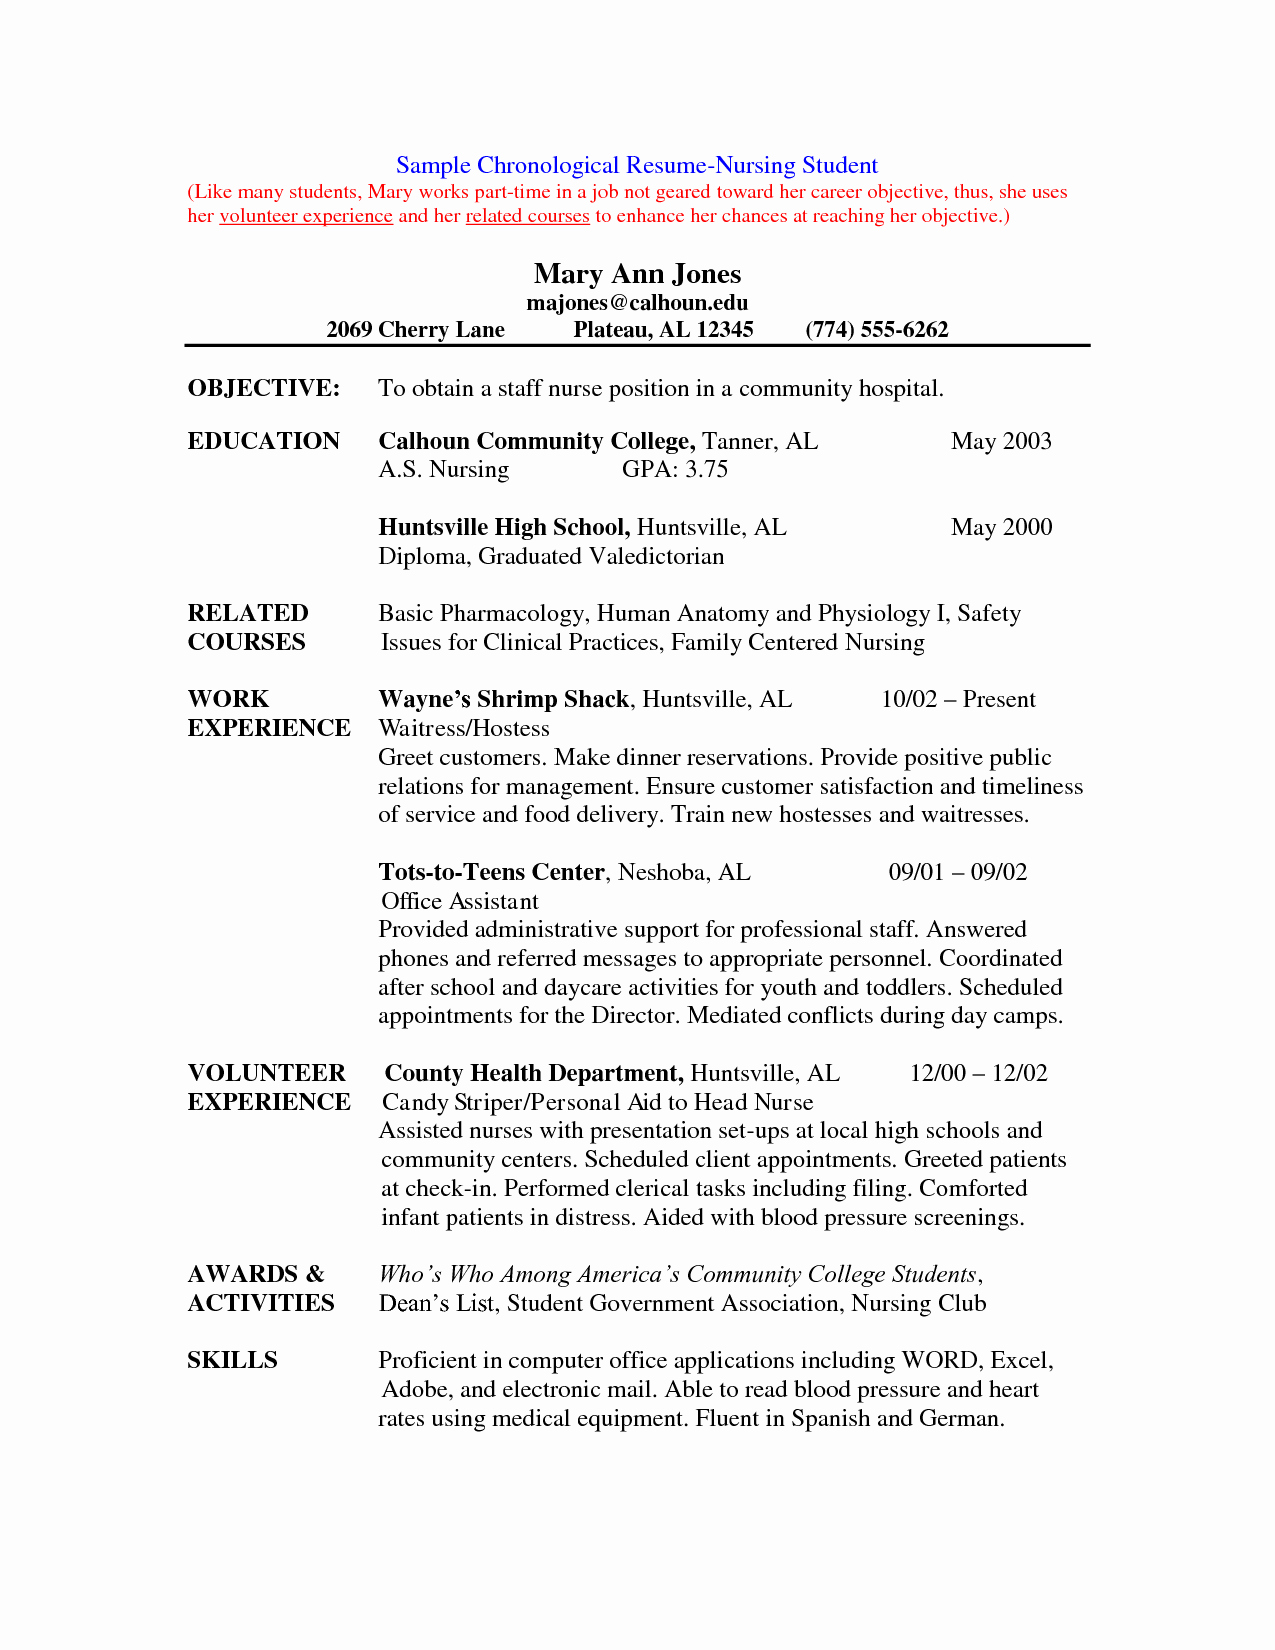 Cover Letters for Nursing Job Application Pdf